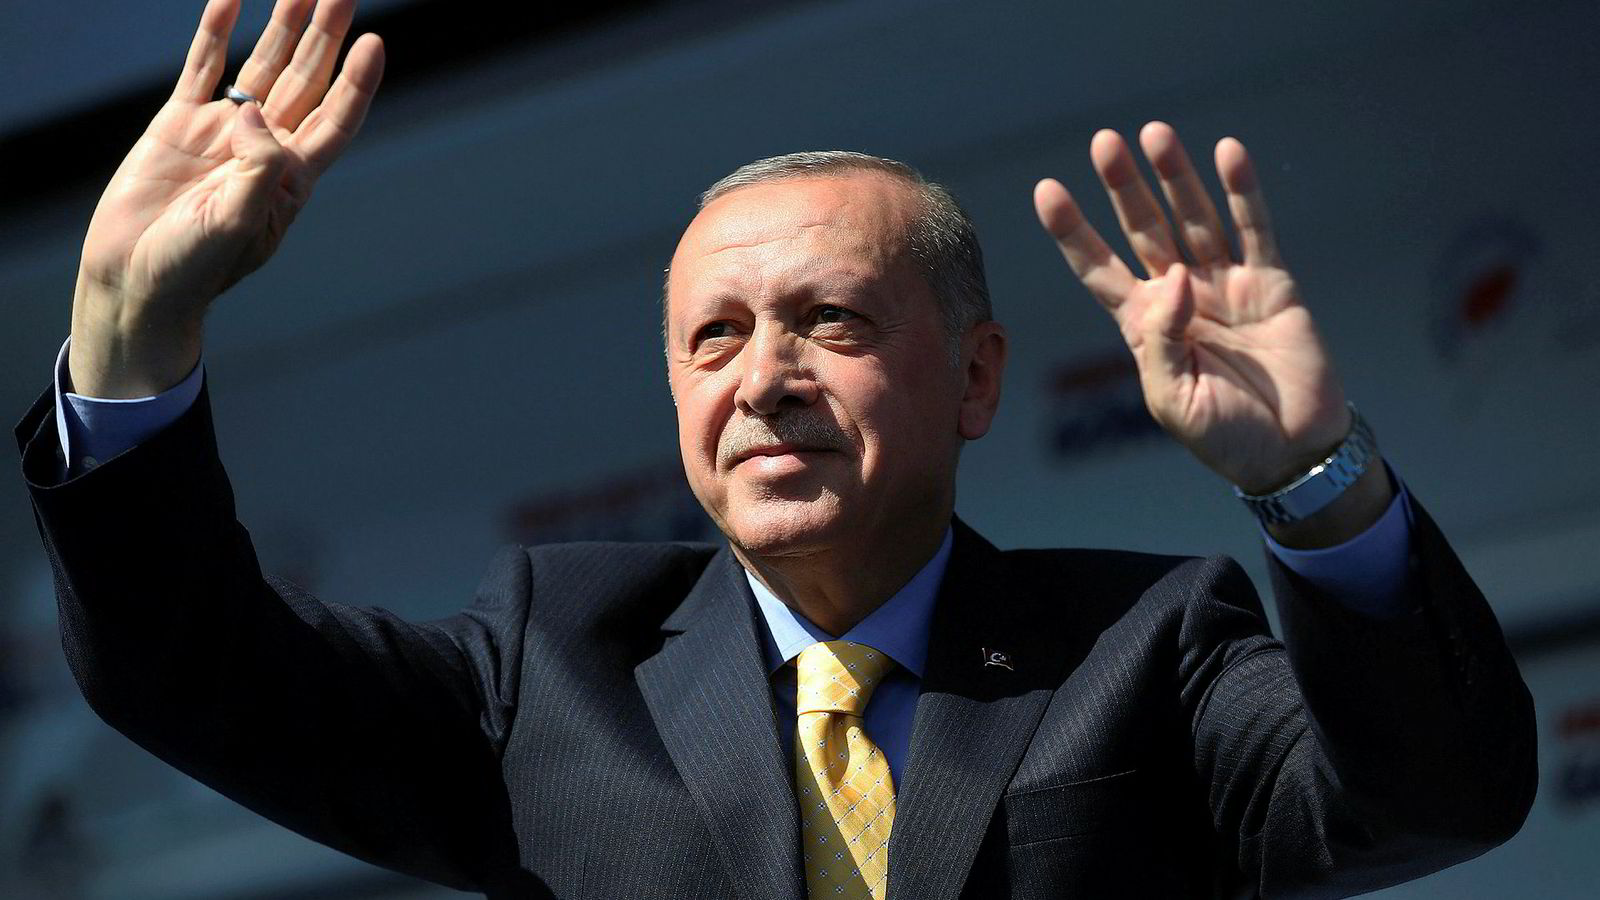 Tyrkias president Recep Tayyip Erdogan.